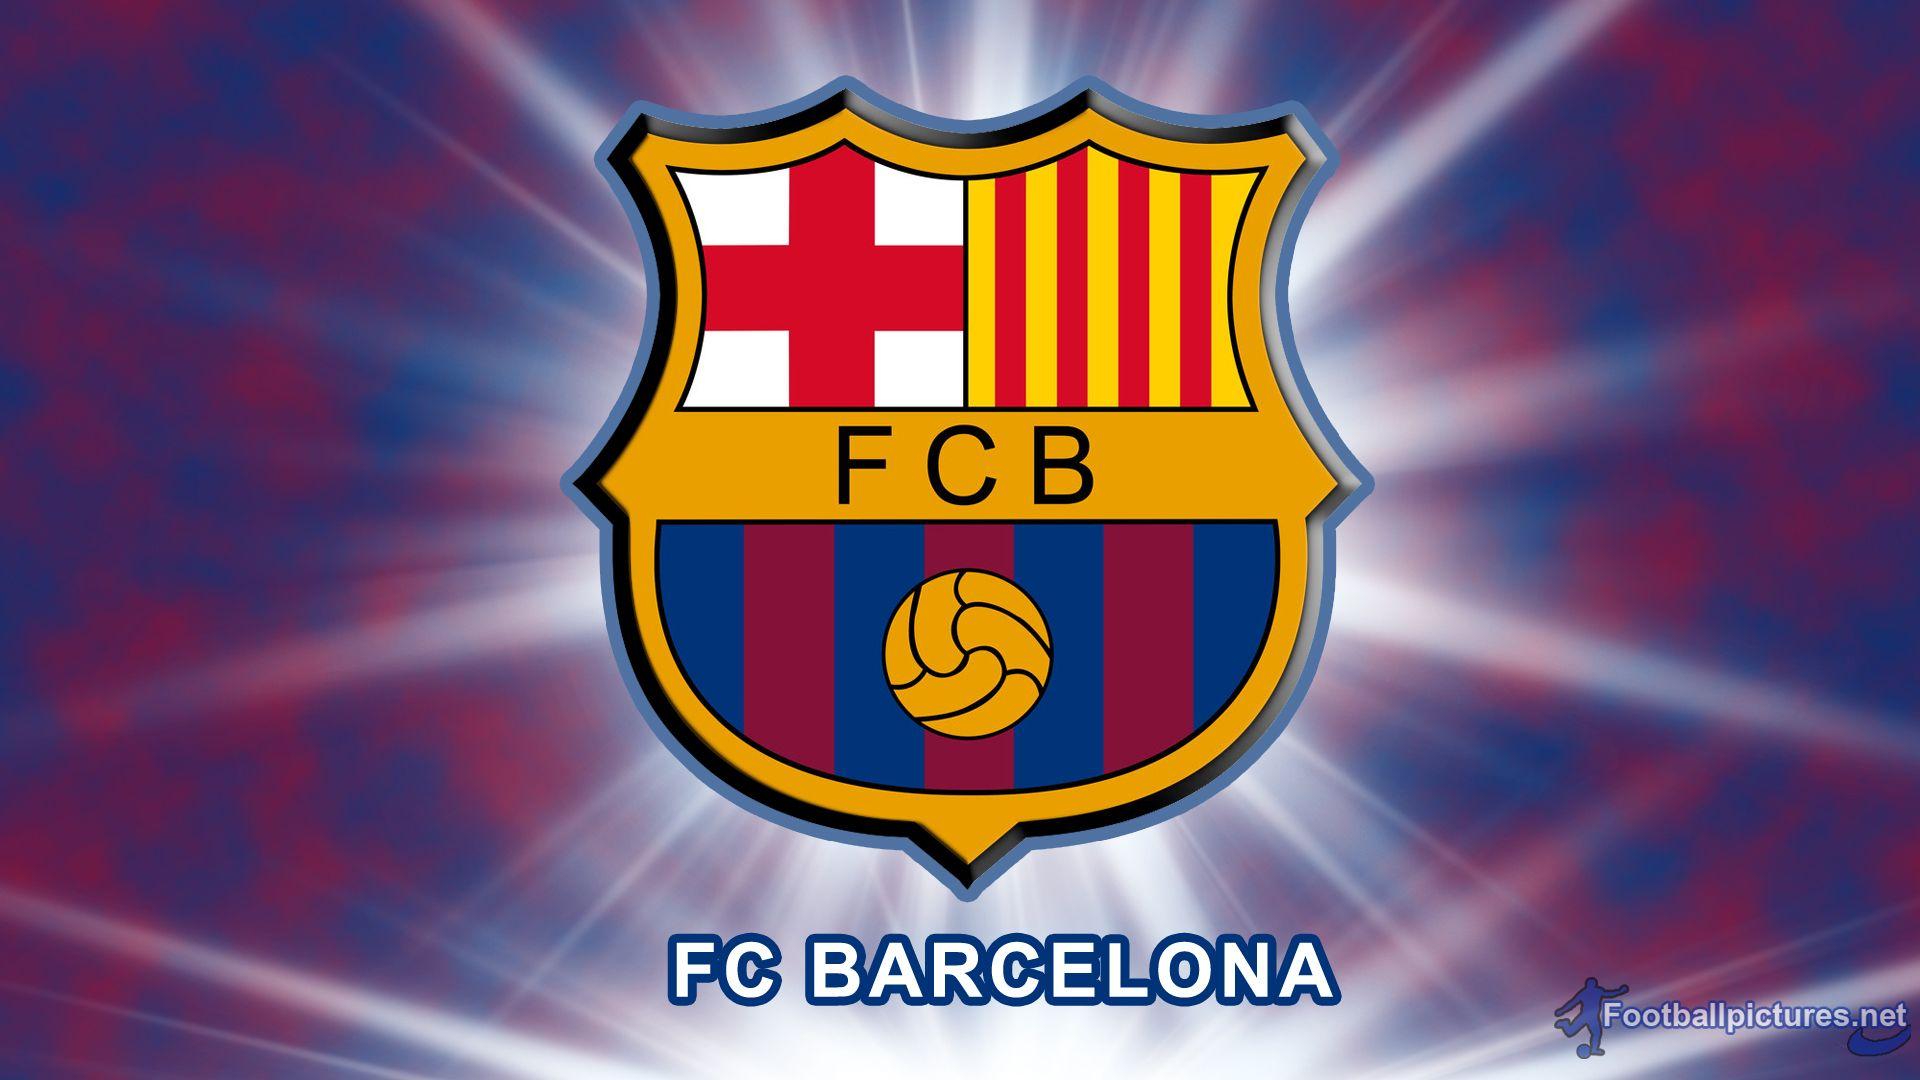 Barca Logo 2015 Barca Logo Wallpaper Barca Logo Hd Barca Team 2015 Sport Finest